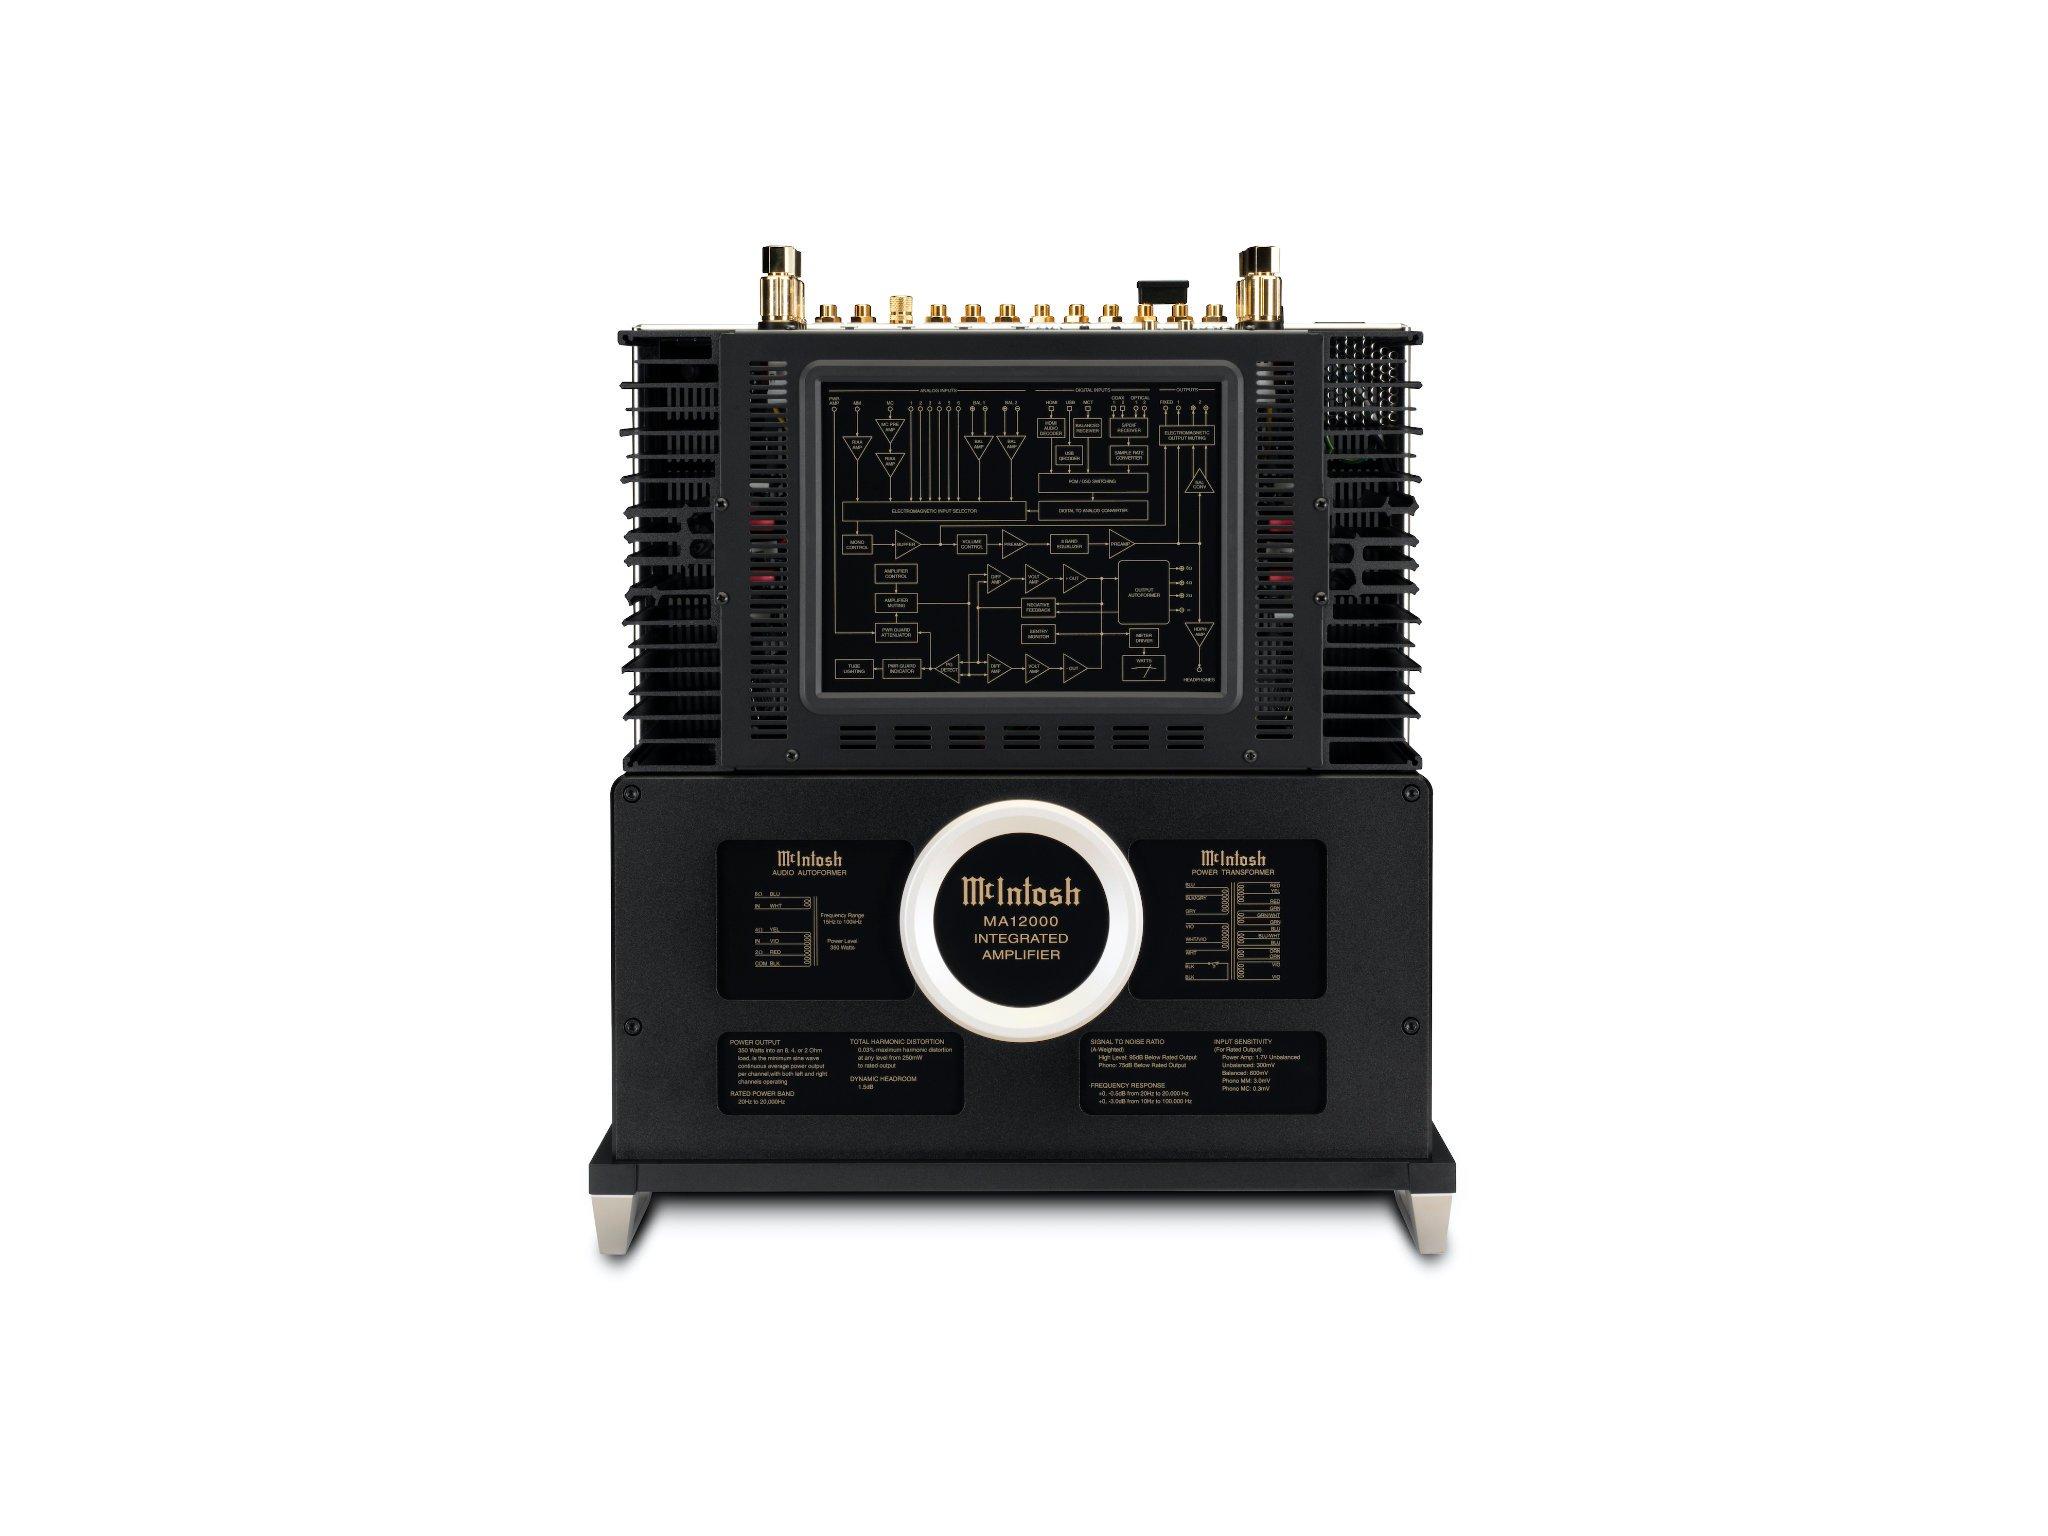 McIntosh MA12000 Integrated Amp